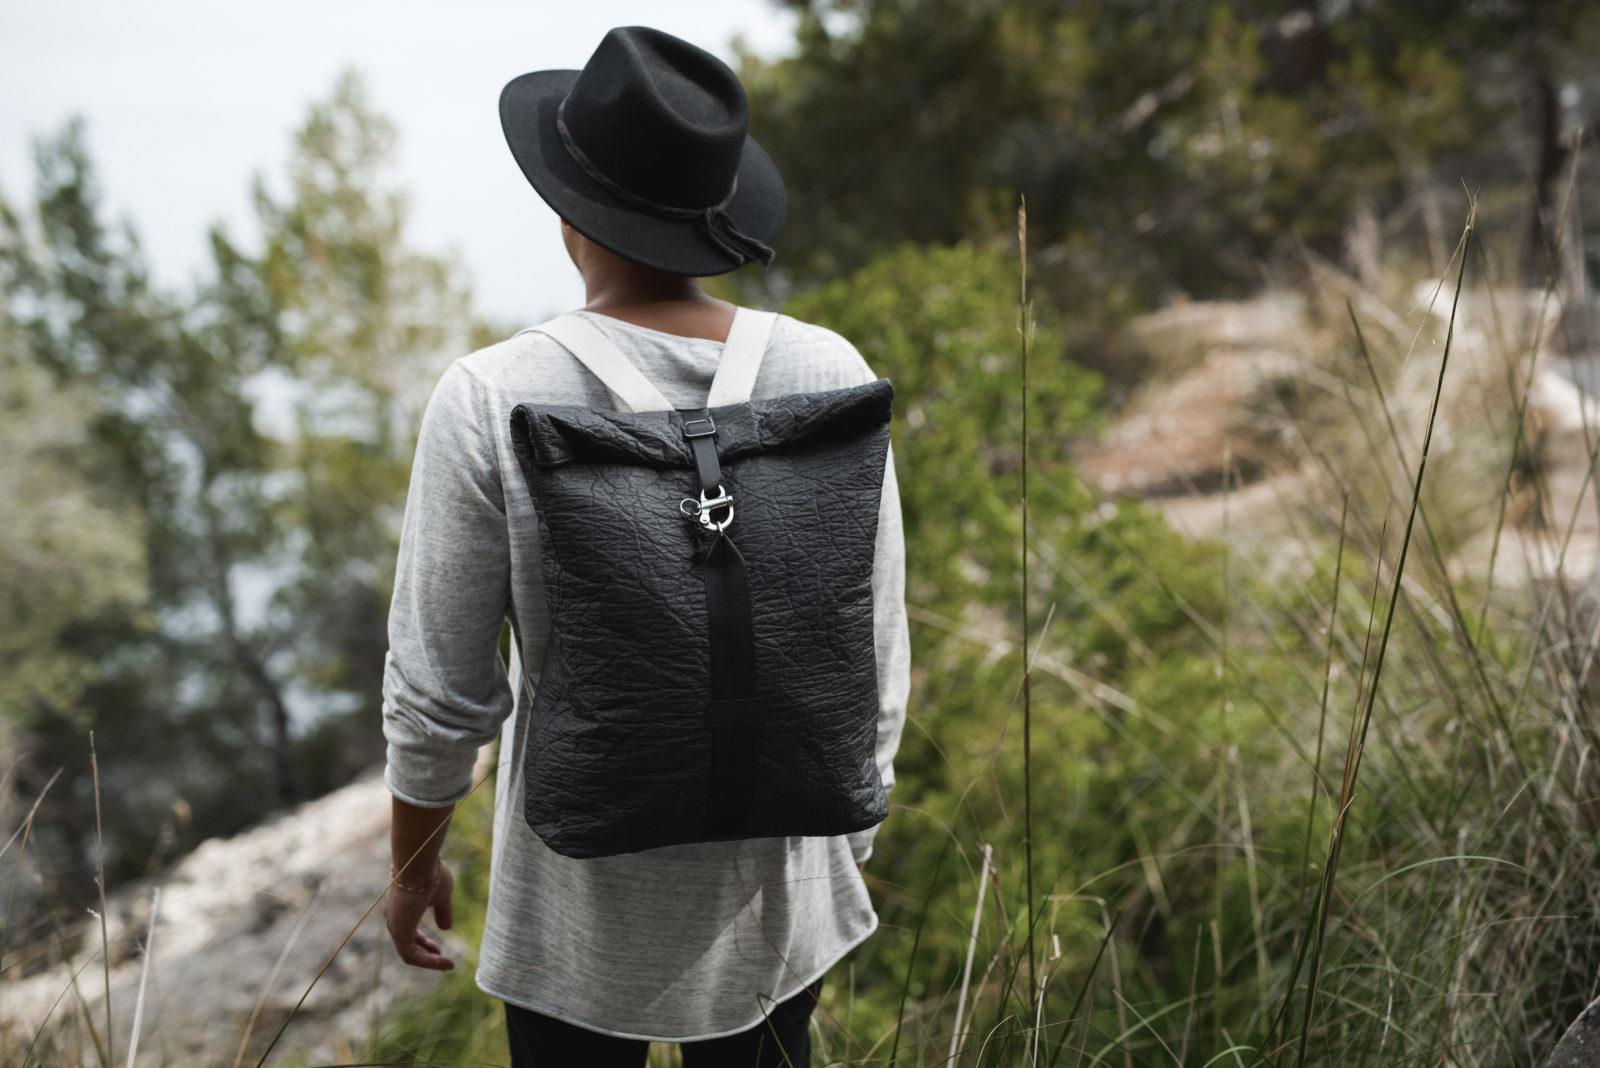 Maravillas Bags | Christina Bussmann | Palma de Mallorca | Fotos: Soravit L | GROSS∆RTIG